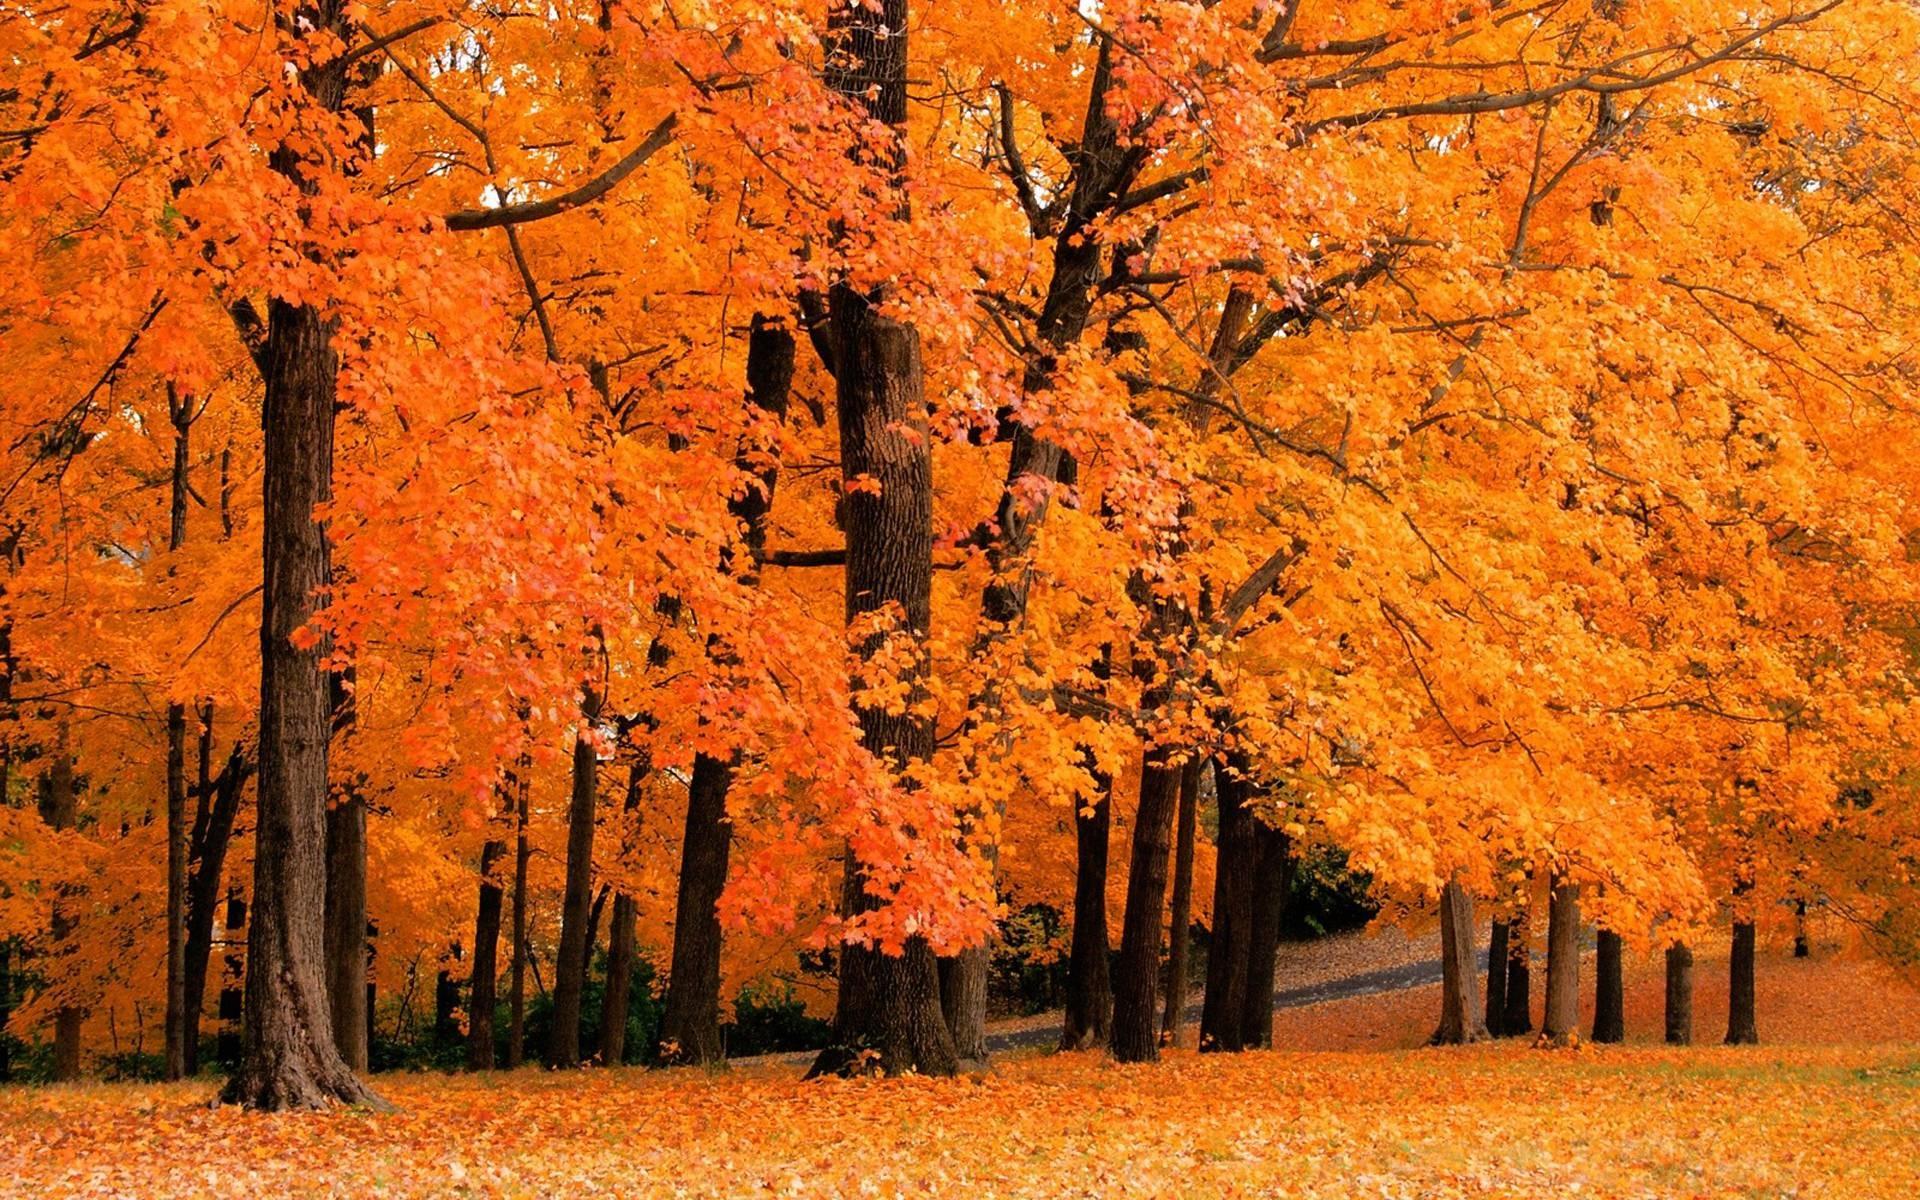 Autumn Pictures For Desktop Backgrounds – Wallpaper Cave